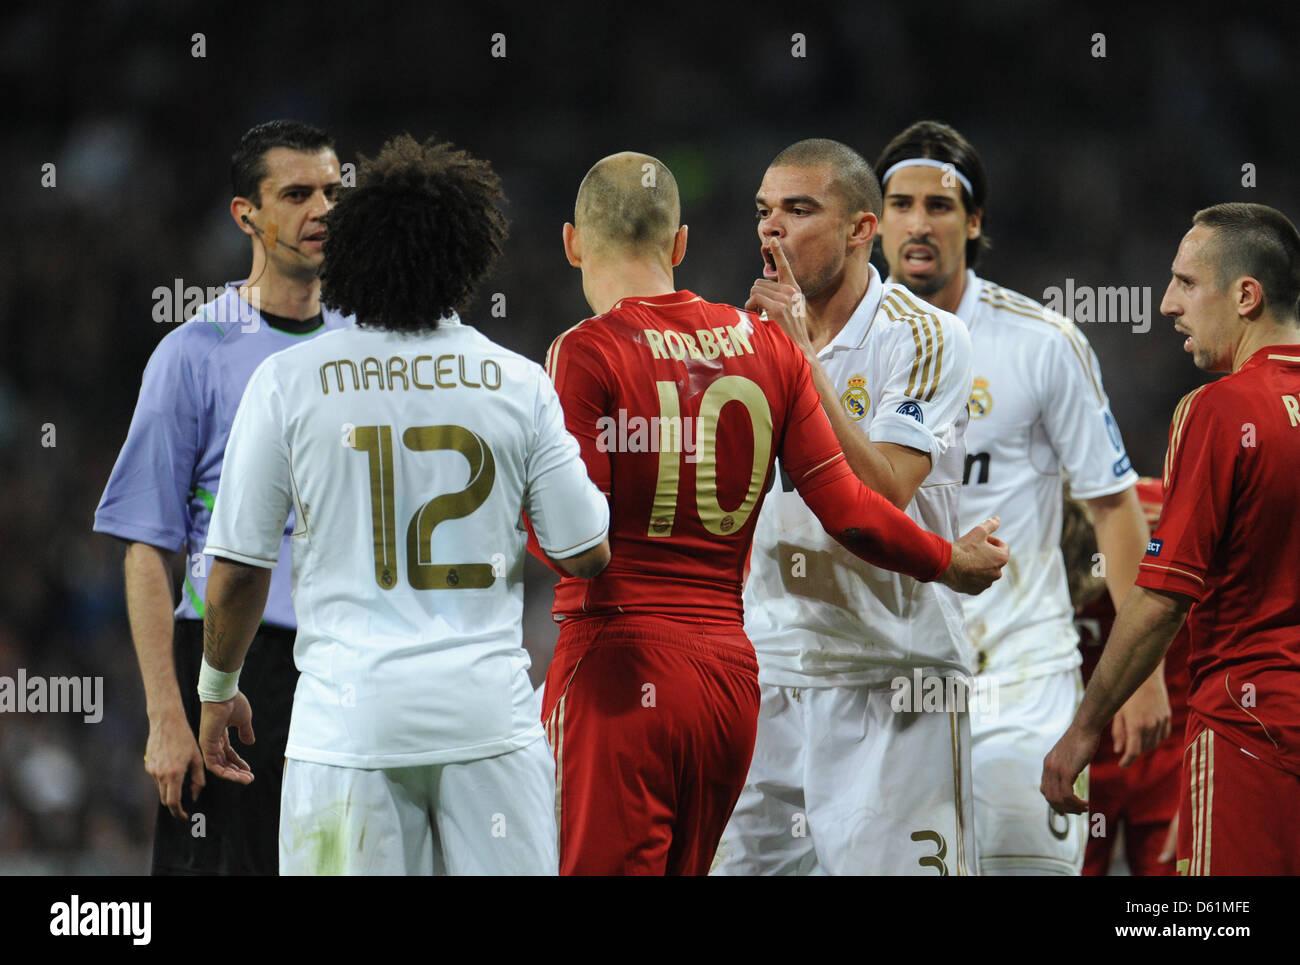 wholesale dealer 8d628 e7b50 Munich's Arjen Robben (C) and Madrid's Marcelo (L, back view ...